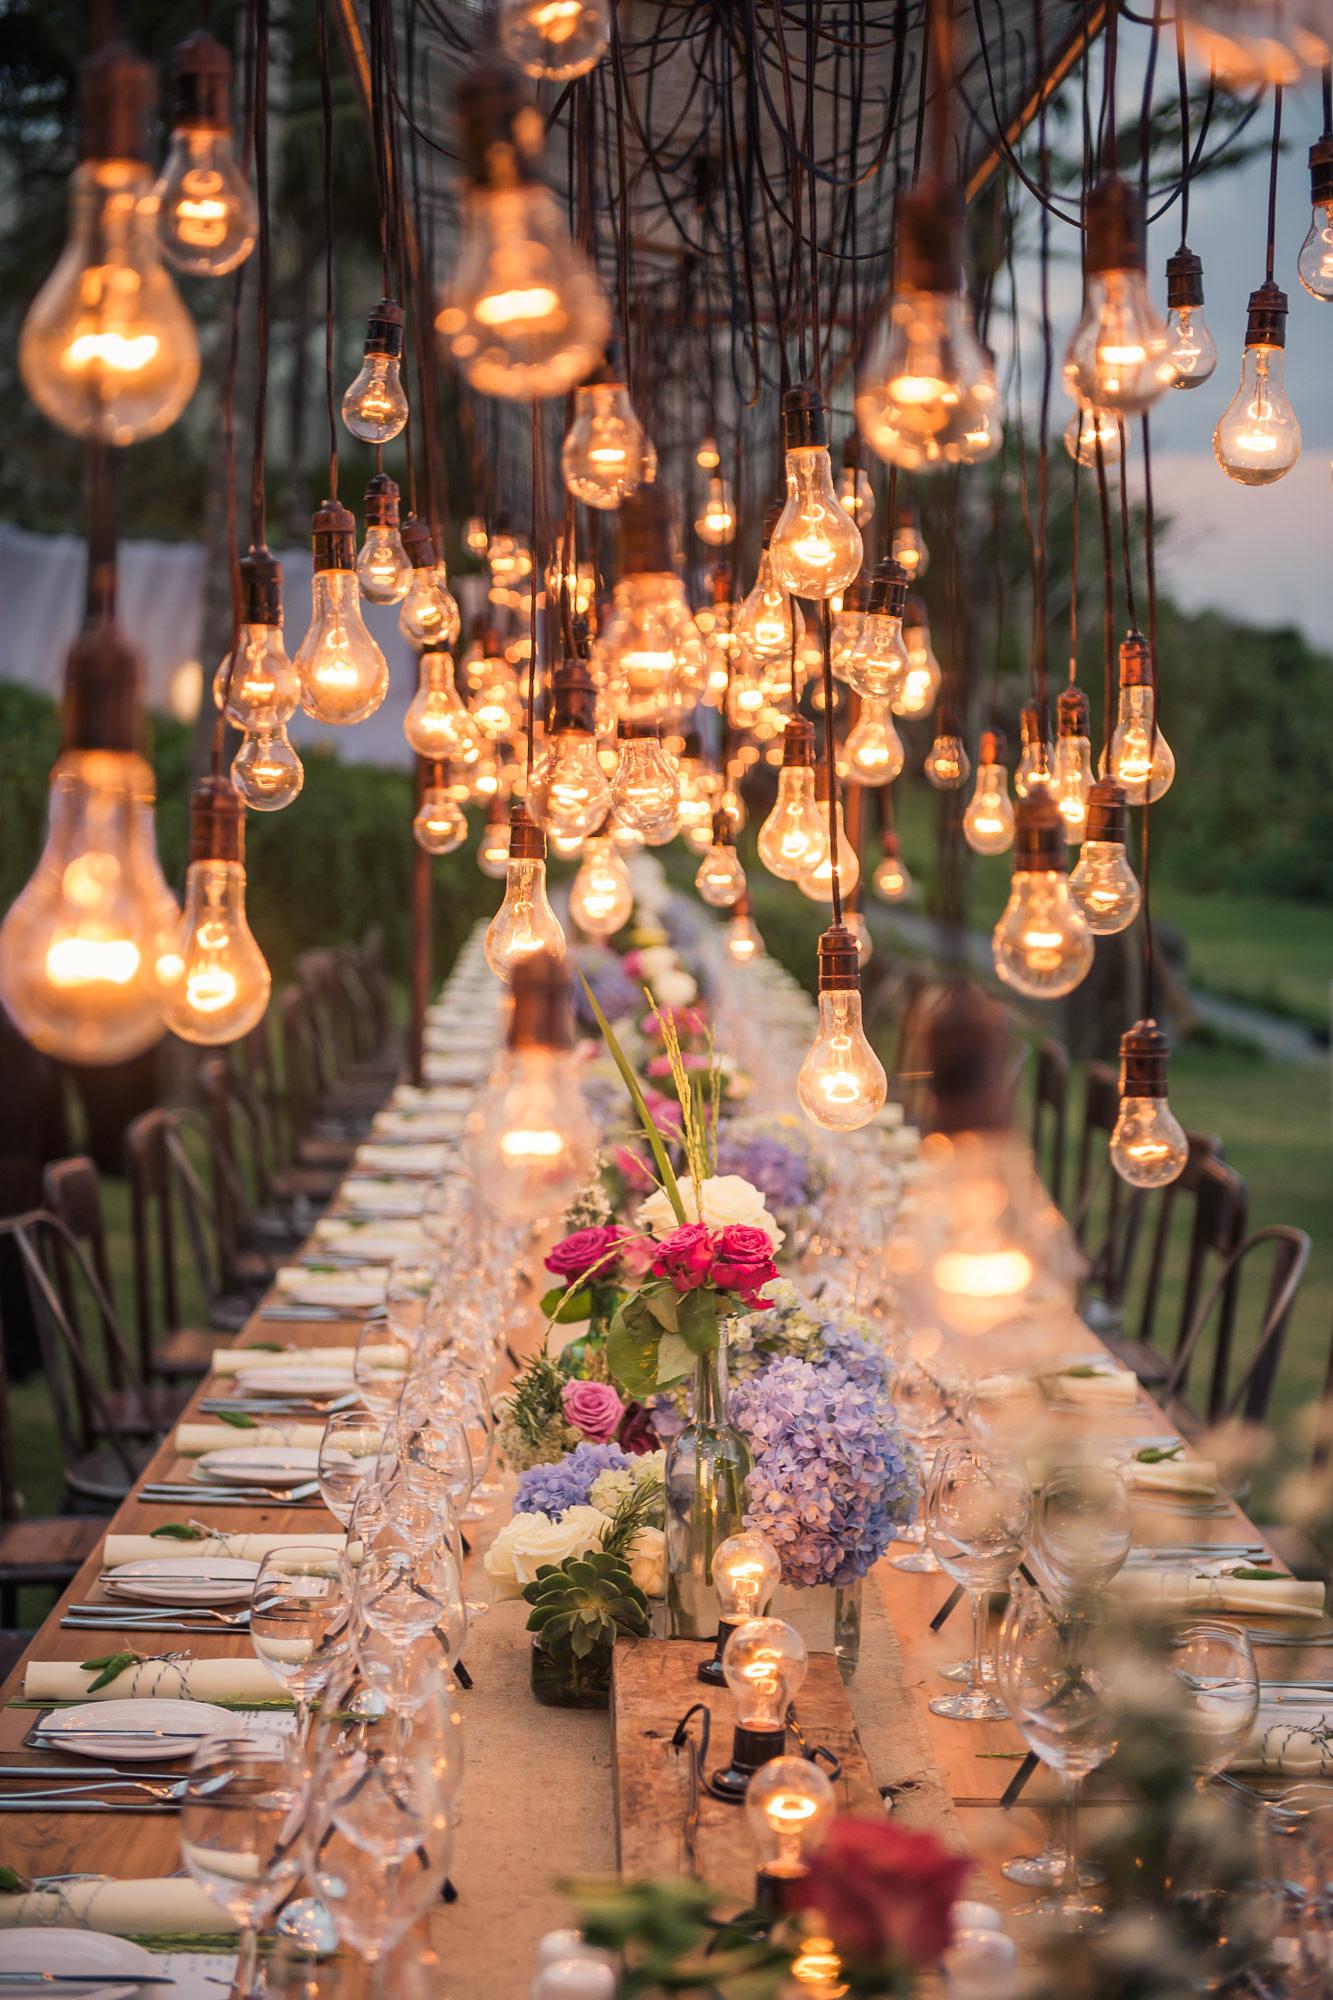 Antique lightbulb chandeliers  - Studio Impressions Photography